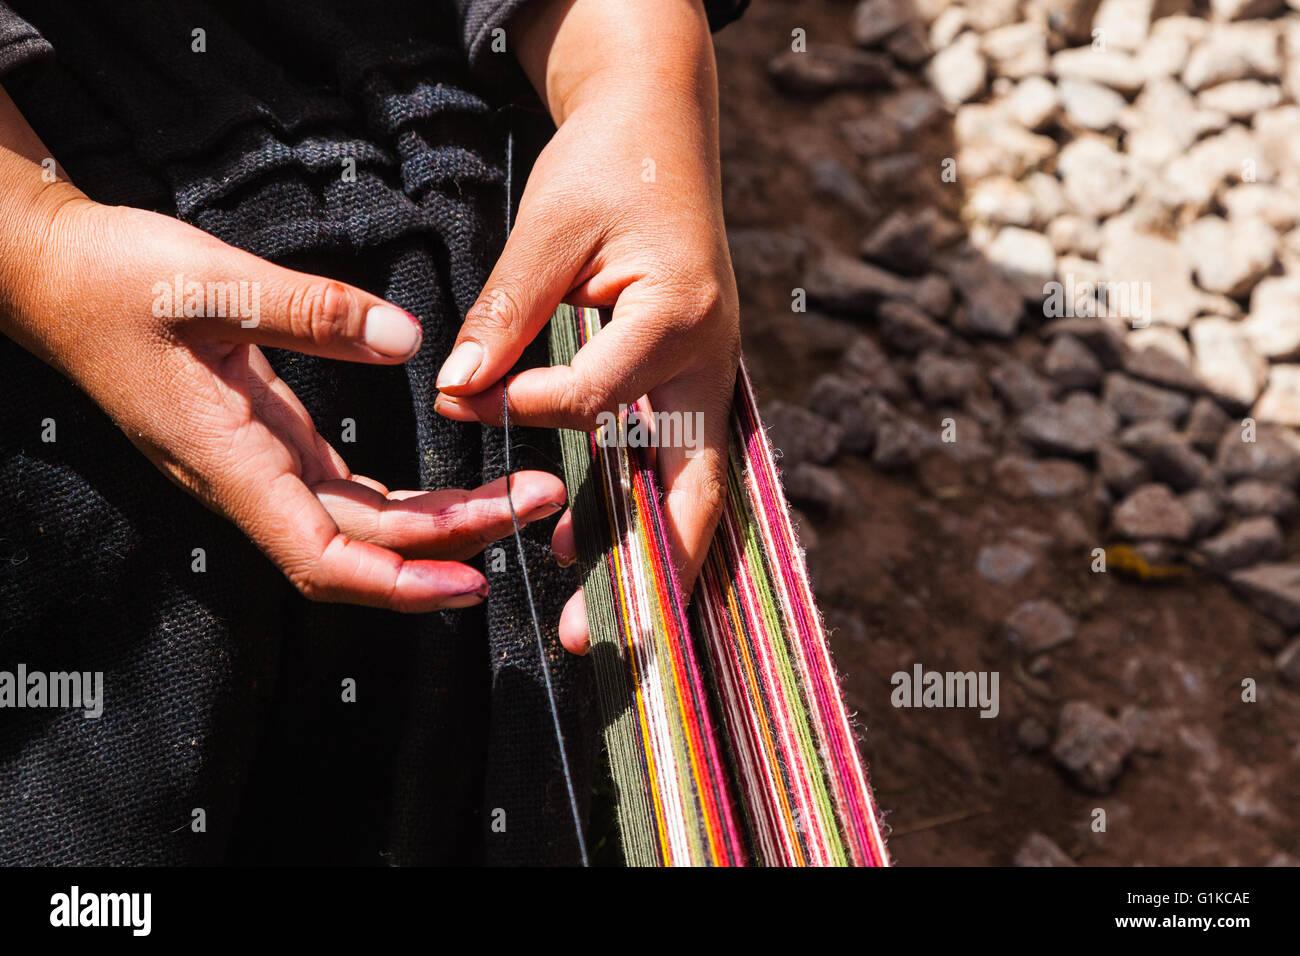 Preparing the warp threads before the start of weaving - Stock Image